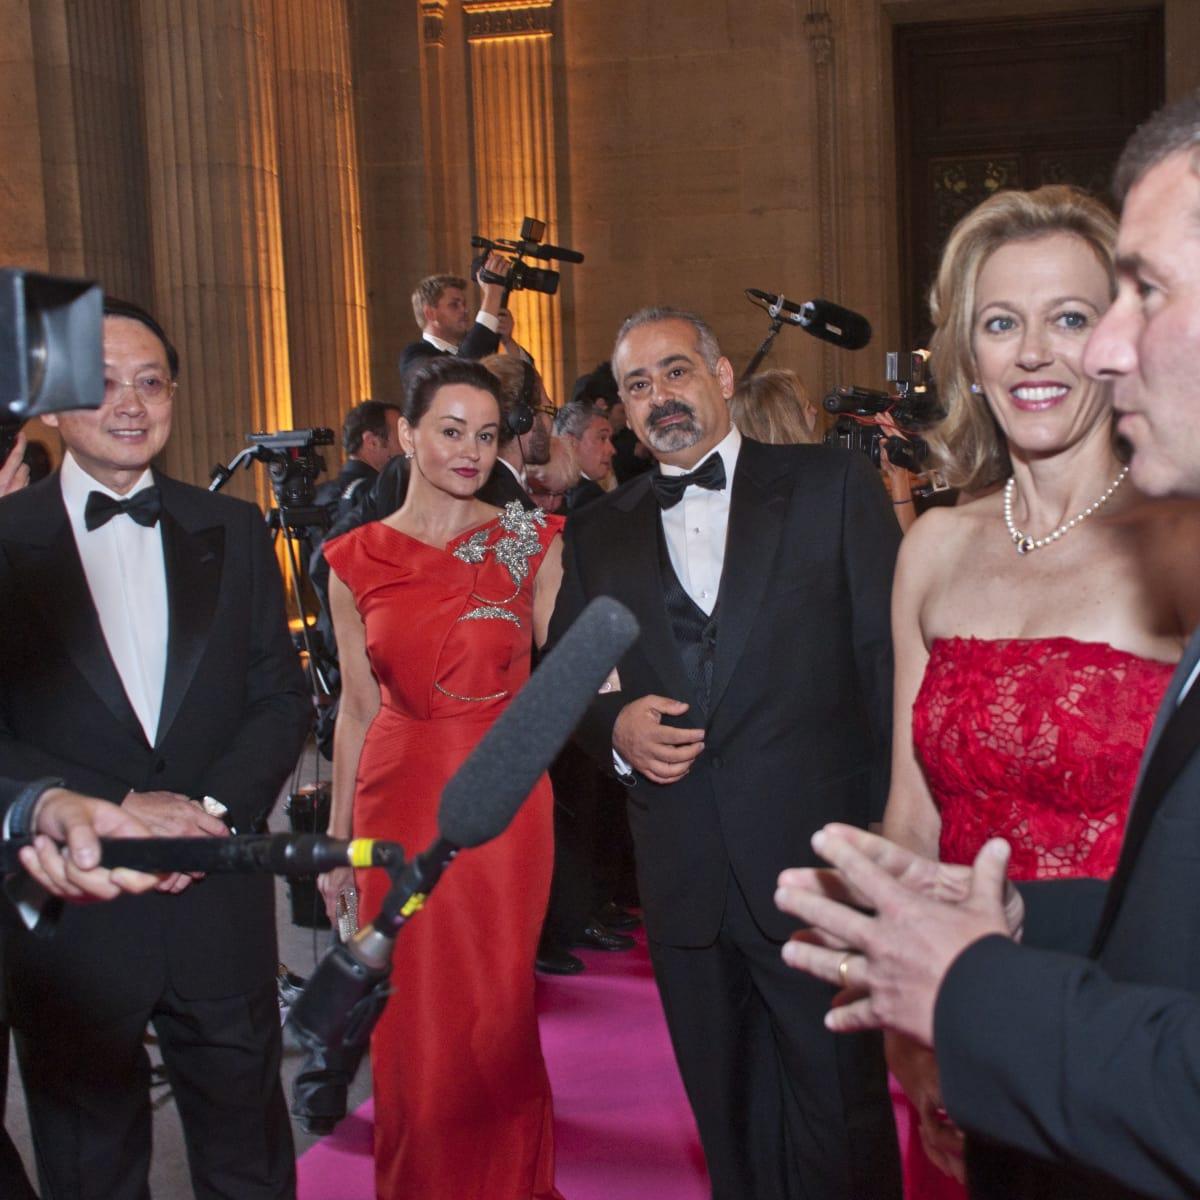 News_Louvre_Susan Tolson_Charles Rivkin_June 2011